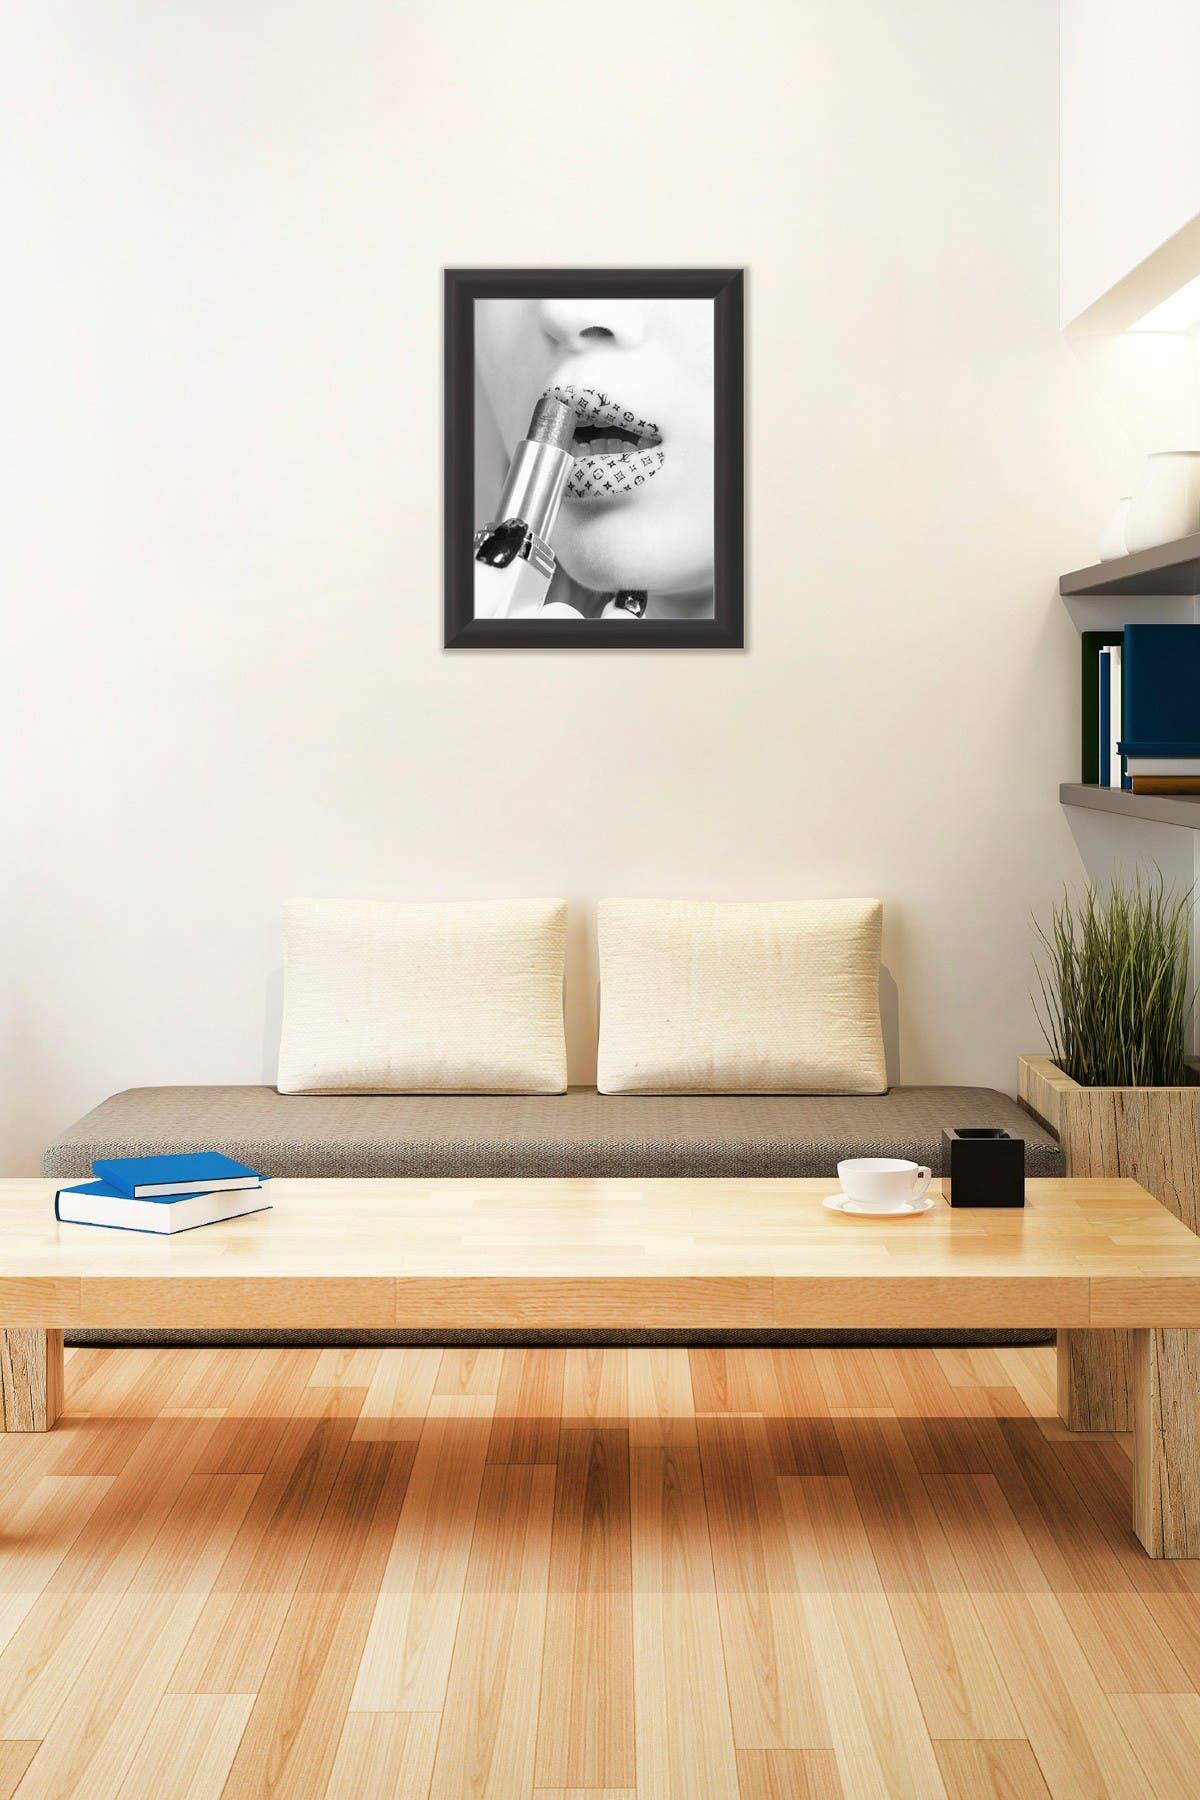 Image of PTM Images Lipstick Framed Giclee Print